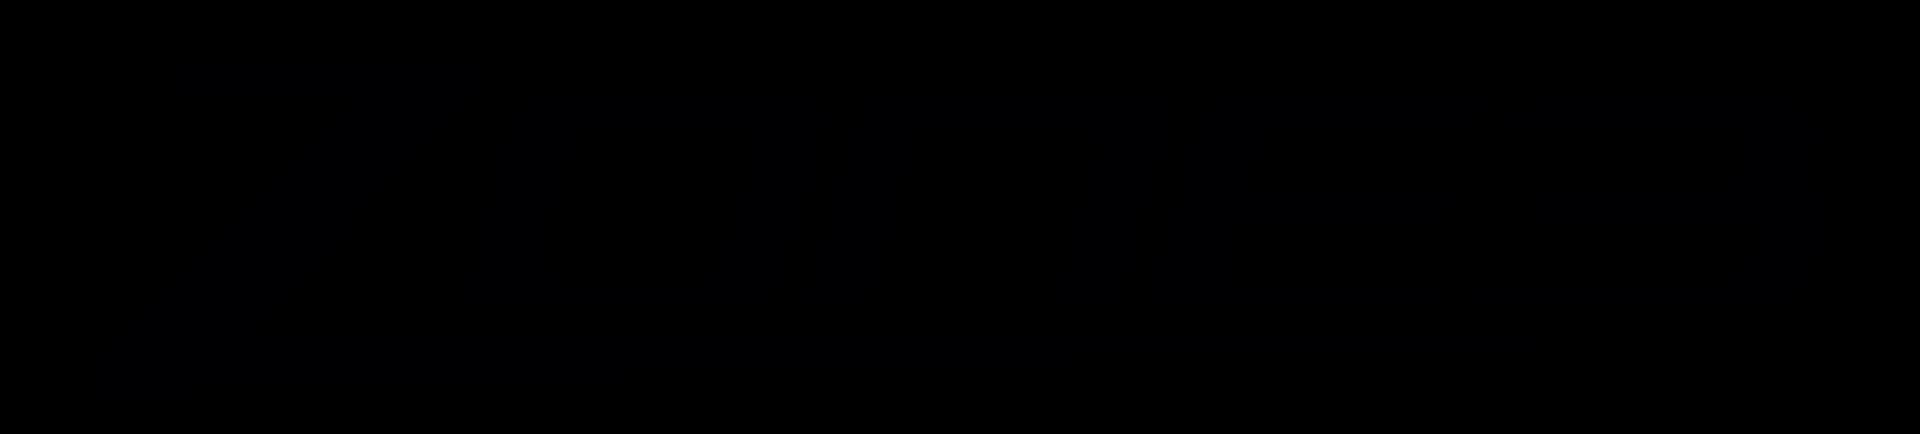 ZONE3 Logo Black